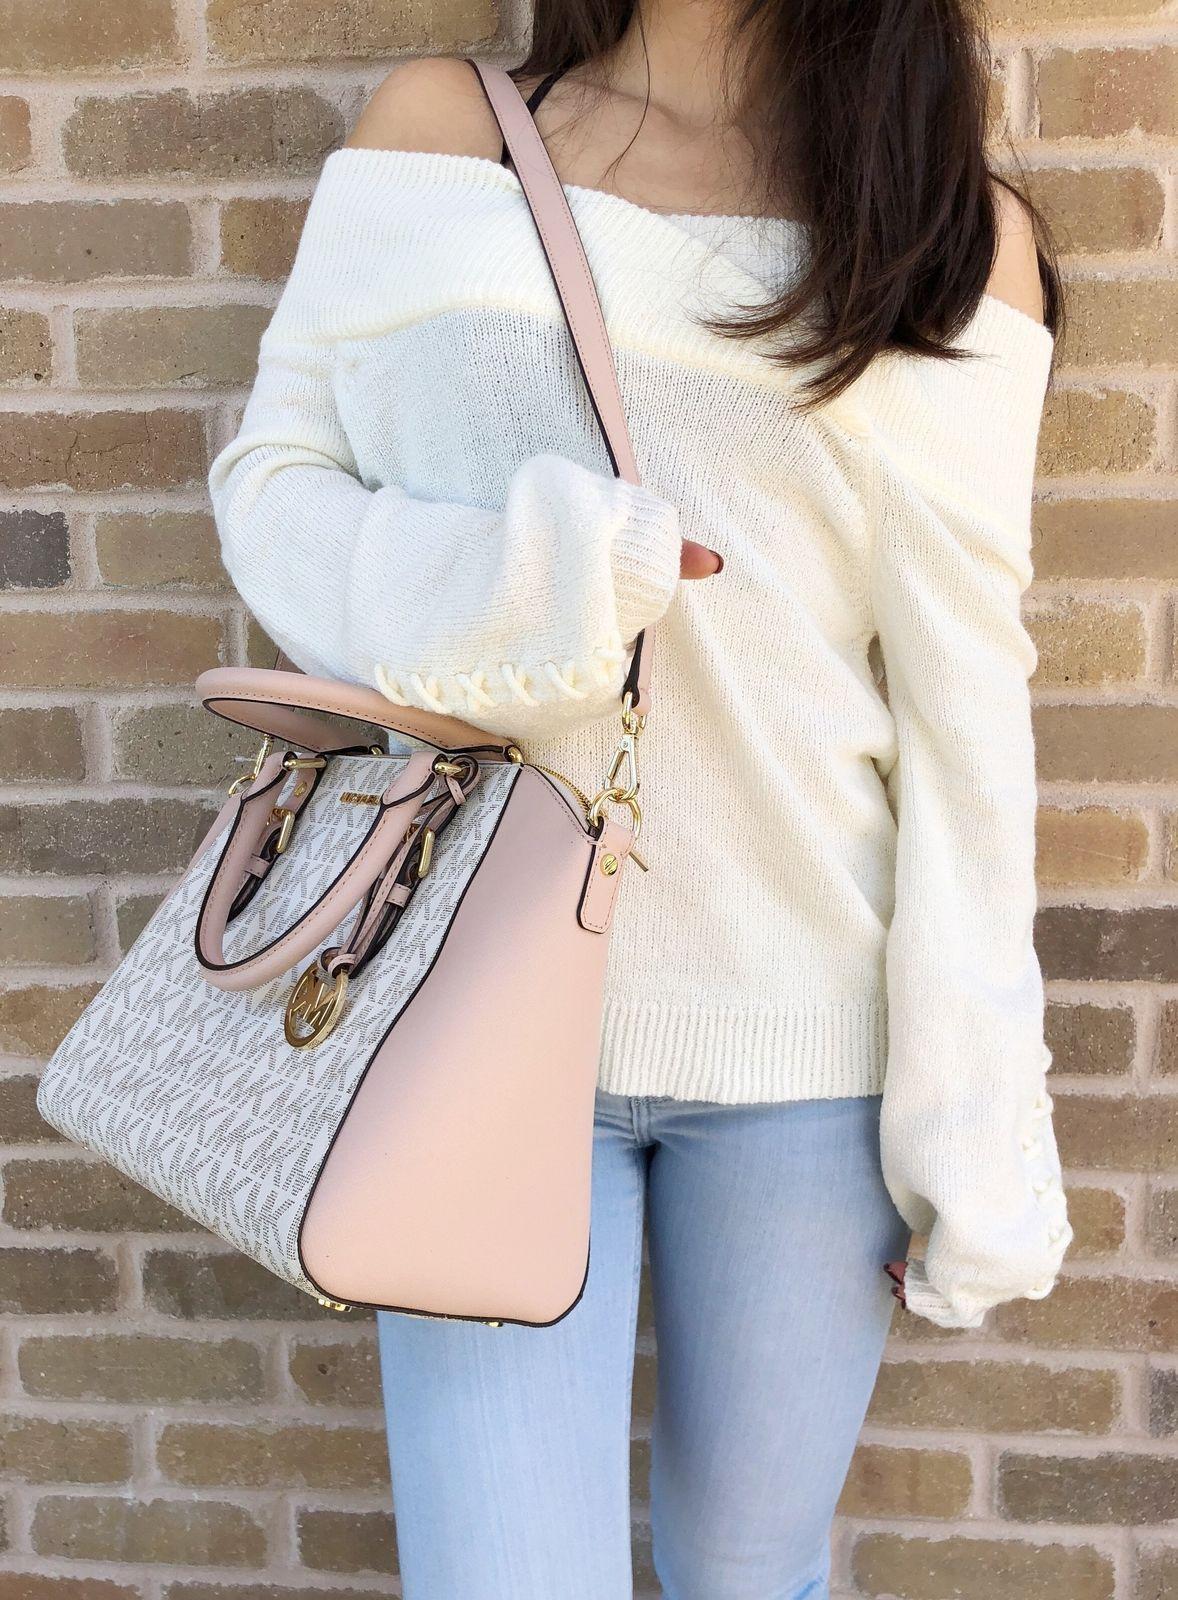 98166ebeaf91 NWT Michael Kors Ciara Large Top Zip Satchel Vanilla Signature MK Ballet  Pink